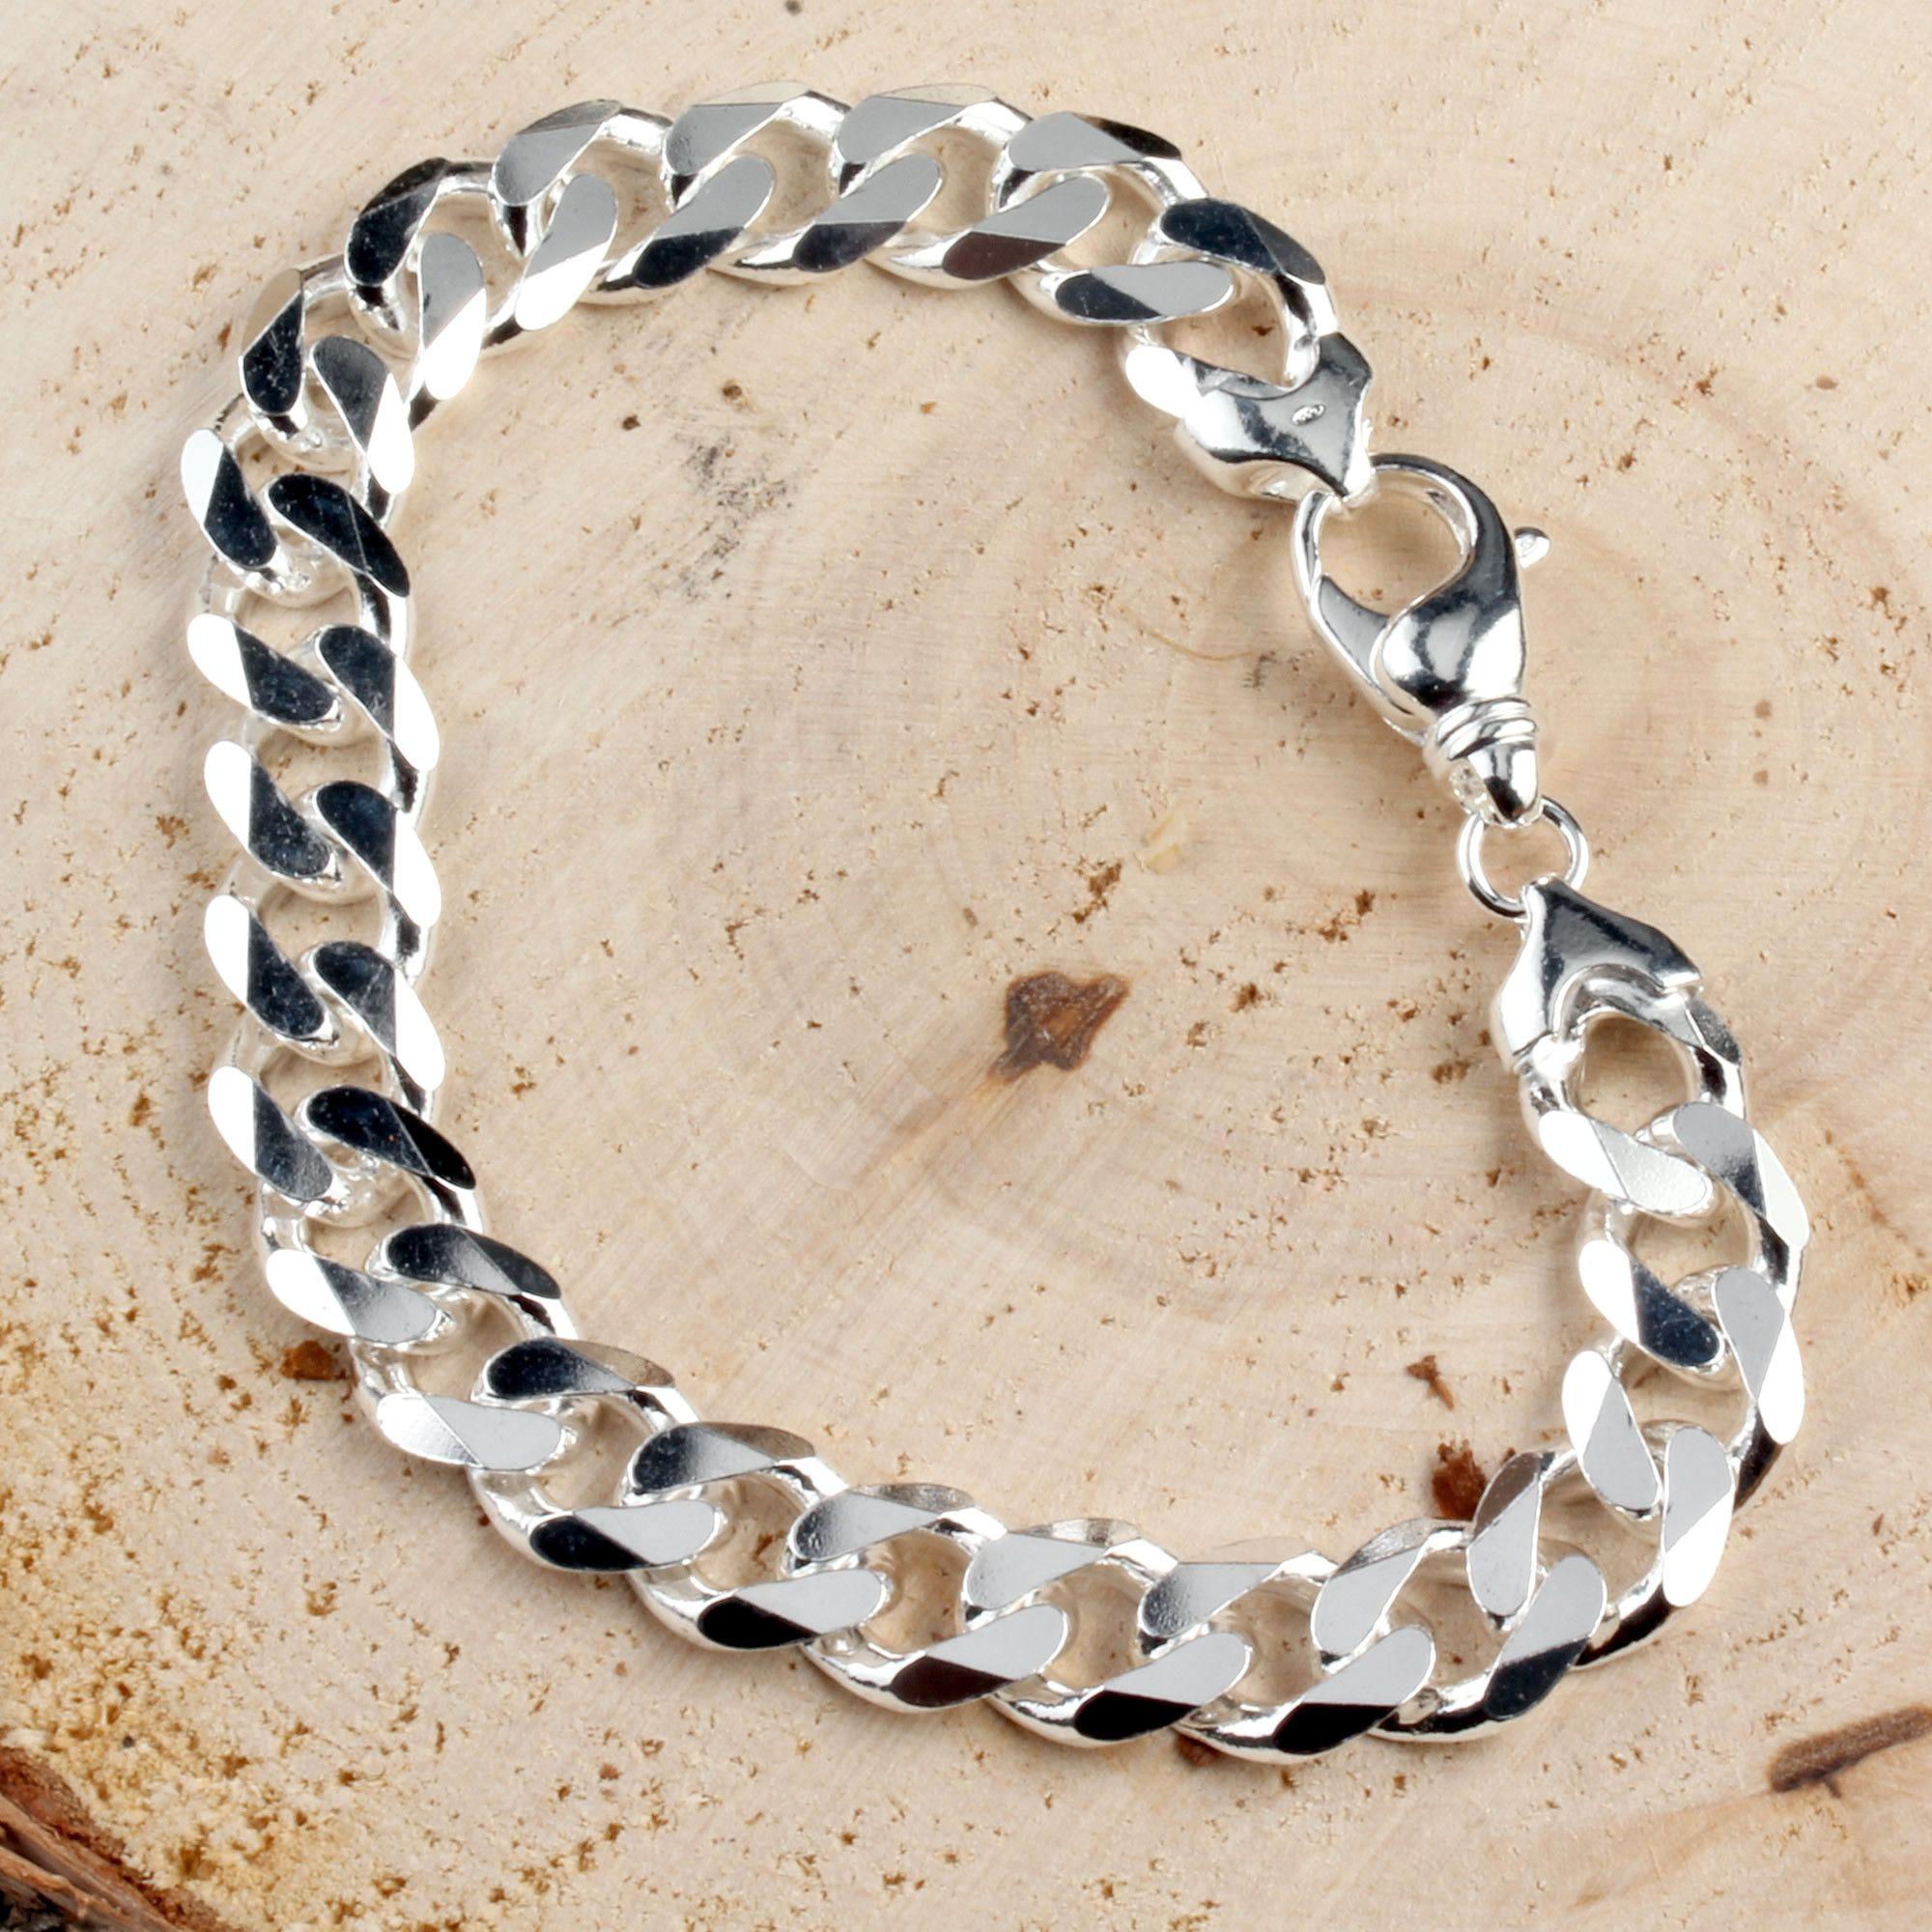 11 3mm Wide Sterling Silver Curb Bracelet